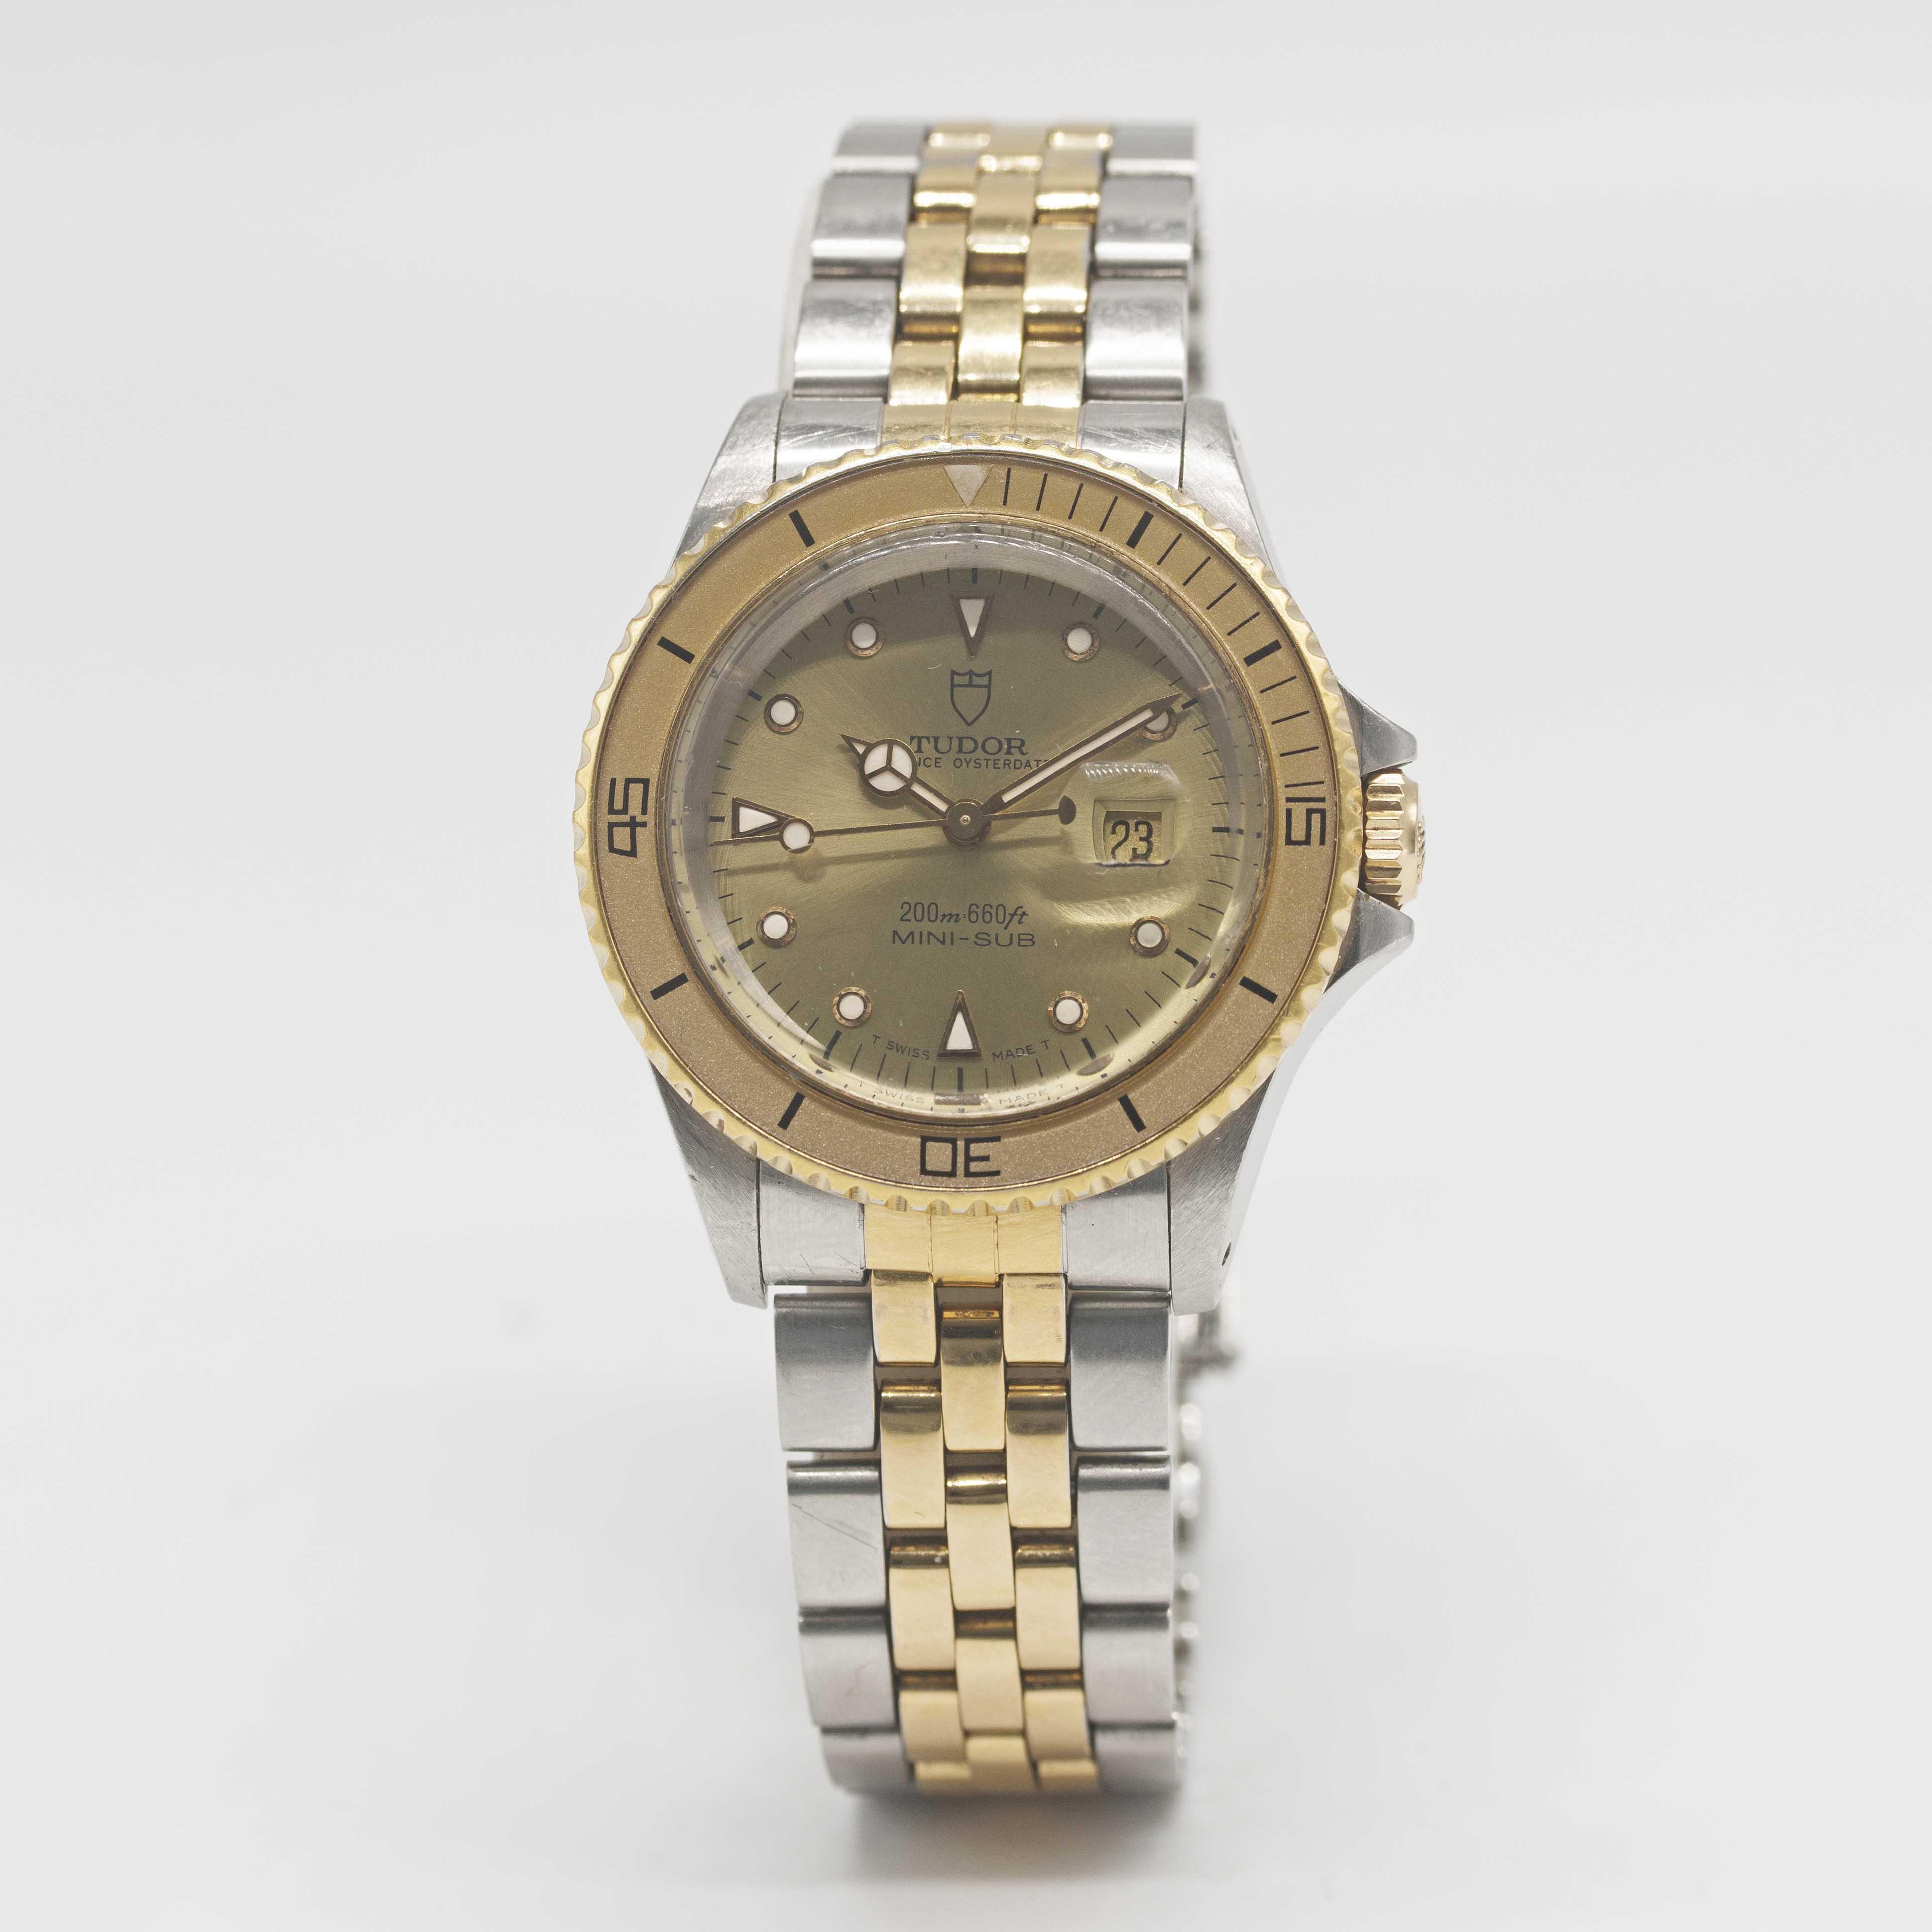 Lot 6 - A LADIES STEEL & GOLD ROLEX TUDOR PRINCE OYSTERDATE MINI SUB BRACELET WATCH CIRCA 1993, REF. 73091